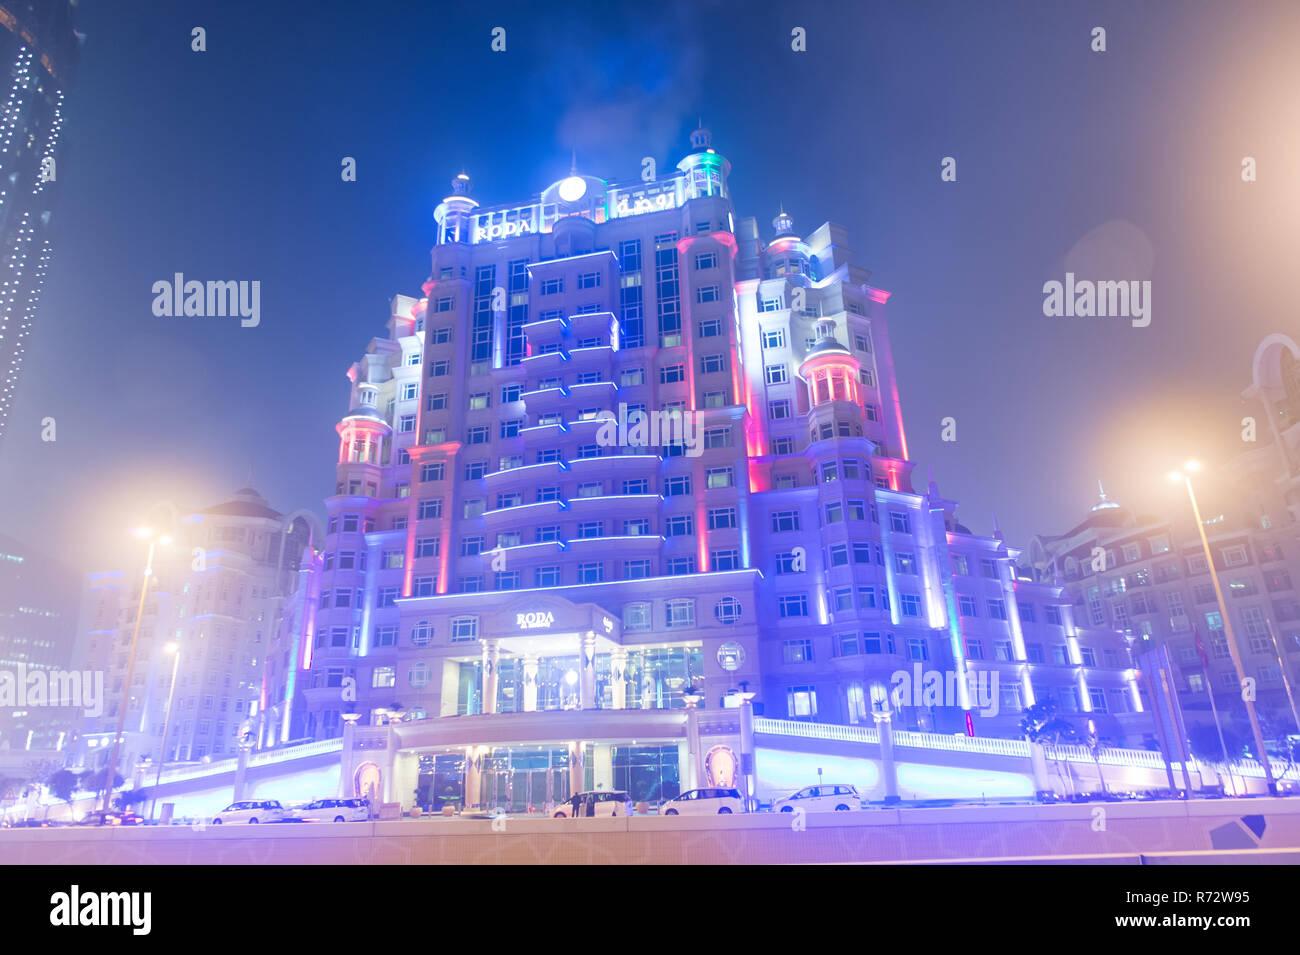 Lighting design hotel stock photos & lighting design hotel stock